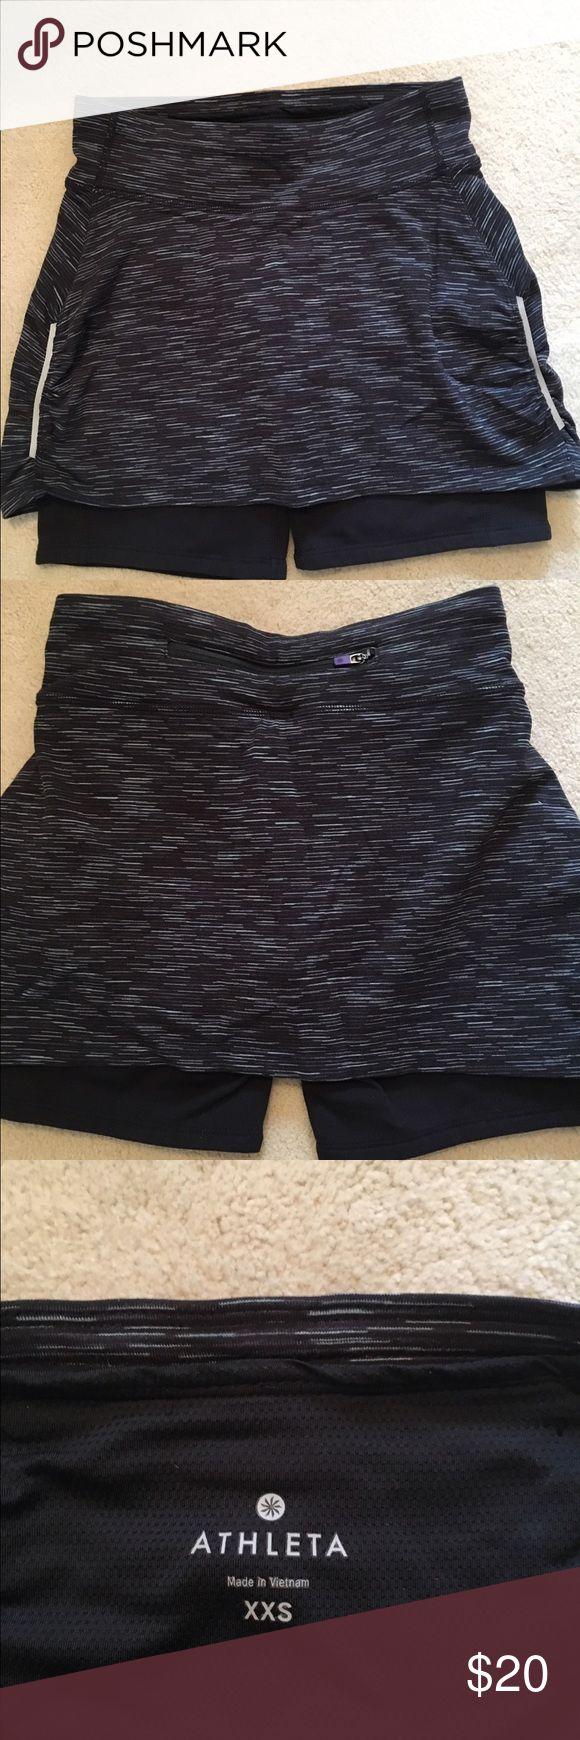 Athleta sport skirt w/ bike shorts, xxs, like new Great for tennis, running, etc.  Size xxs,  worn couple times but no longer fits.  Has zip pocket in back.  Like new condition. Athleta Shorts Skorts